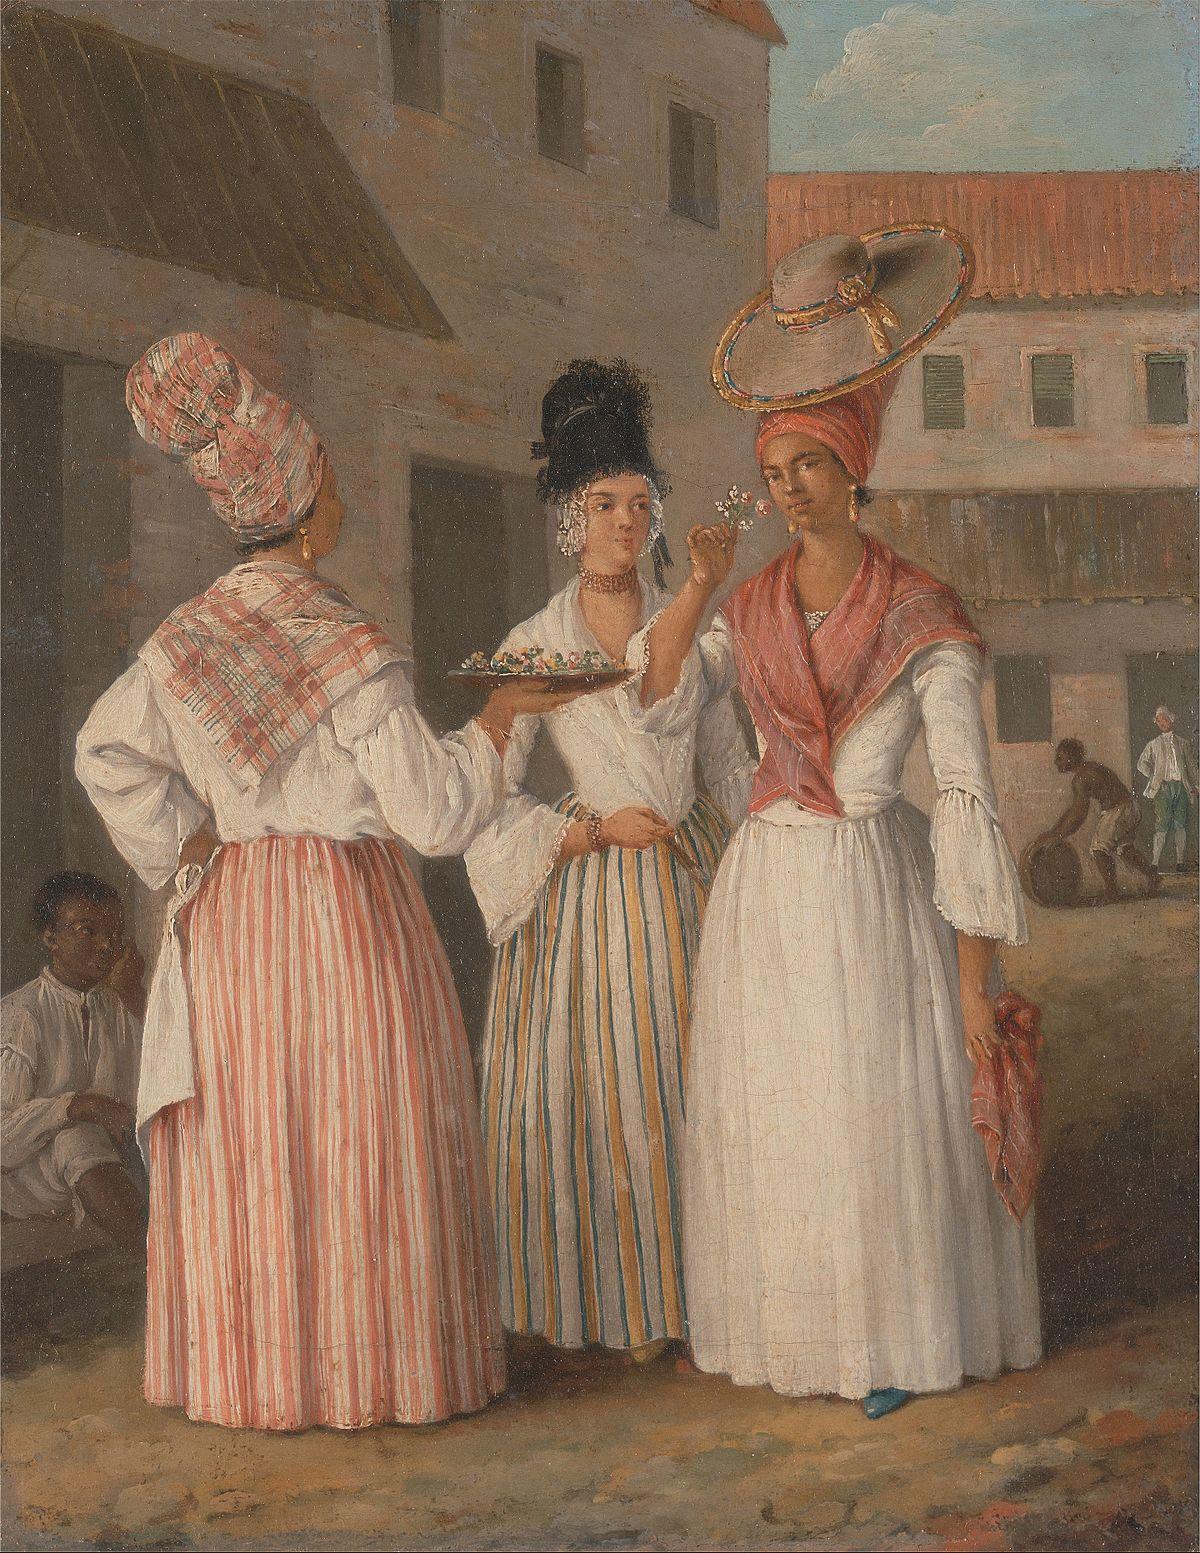 Western Hat Women Fashion